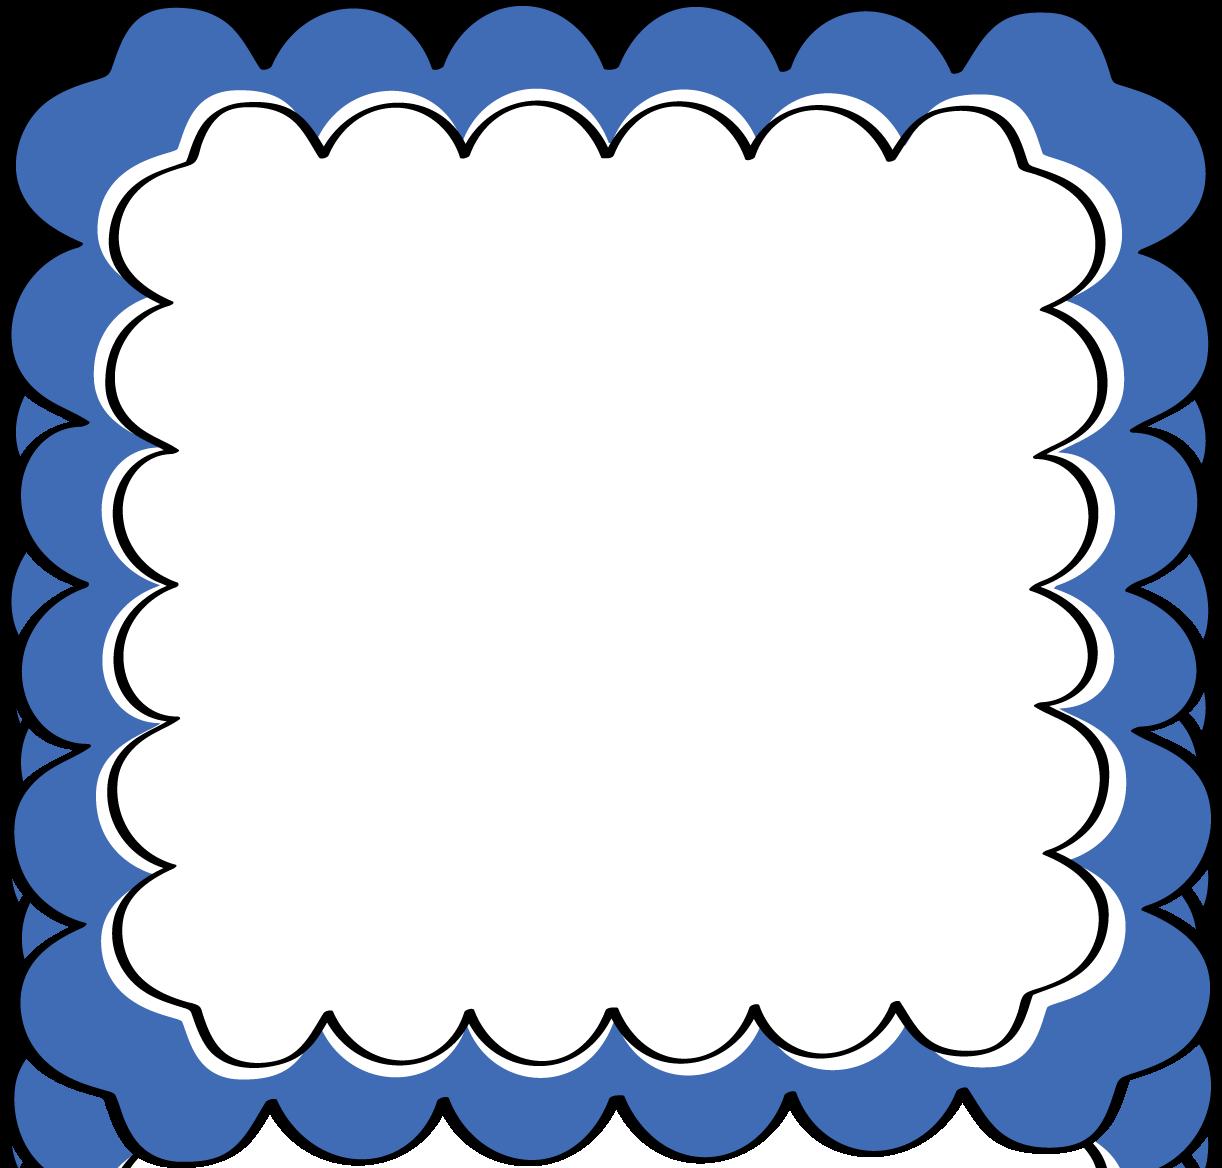 Blue frame clipart » Clipart Station.